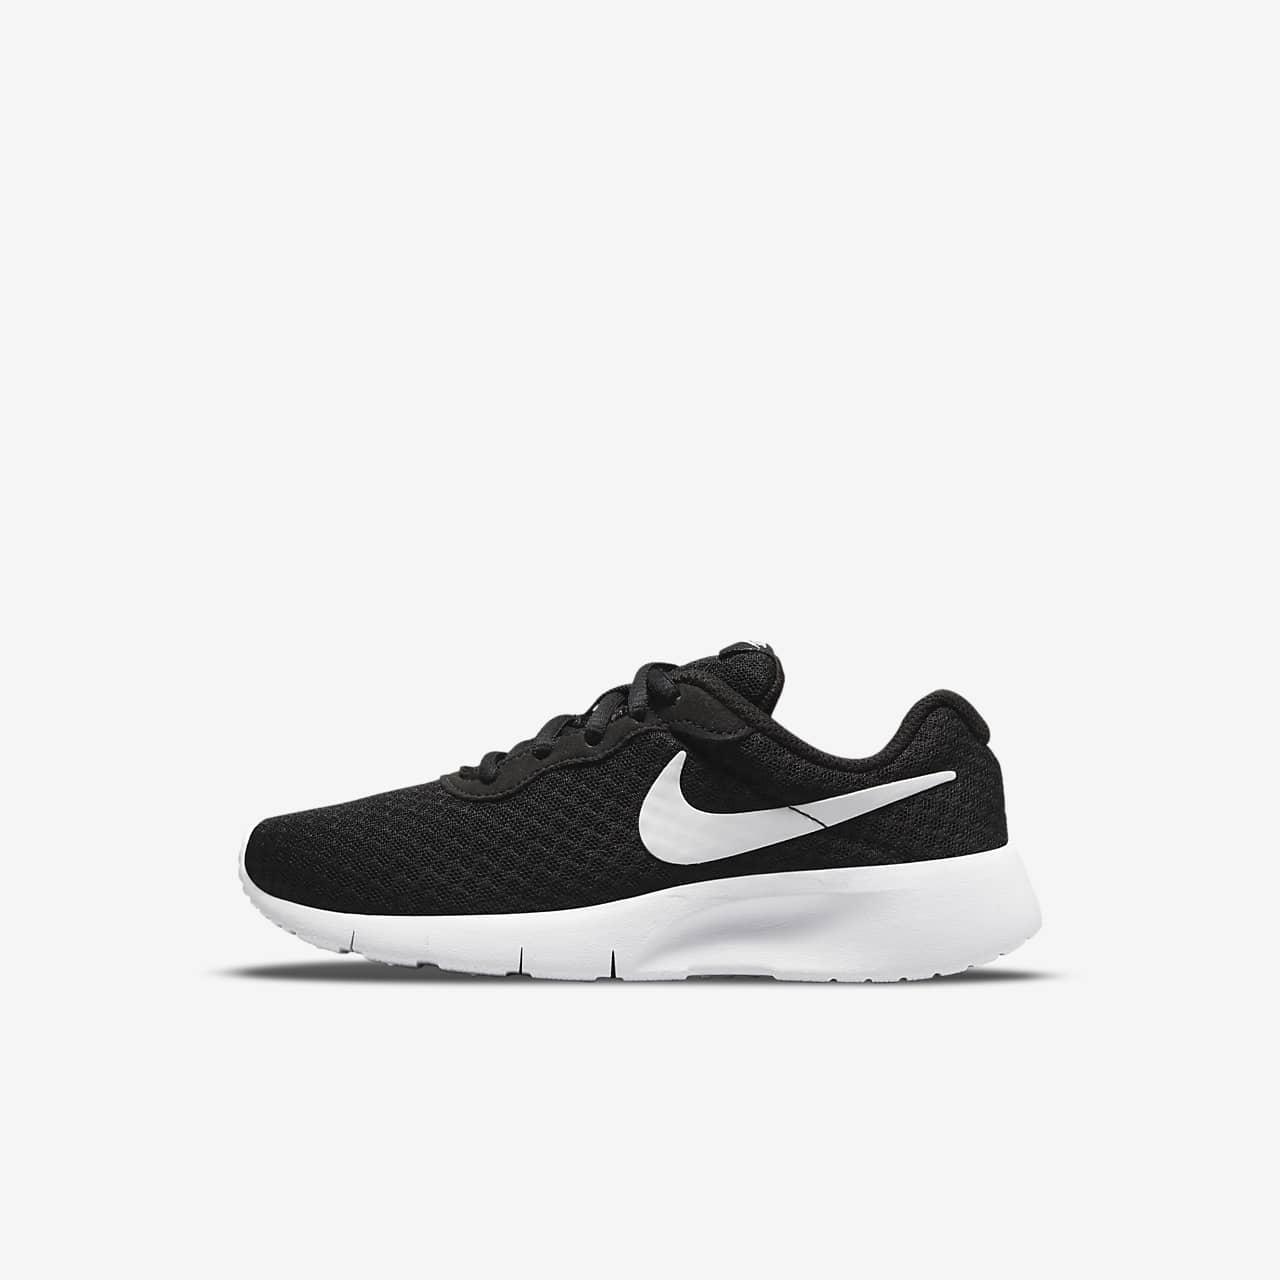 Nike Tanjun Kleuterschoen